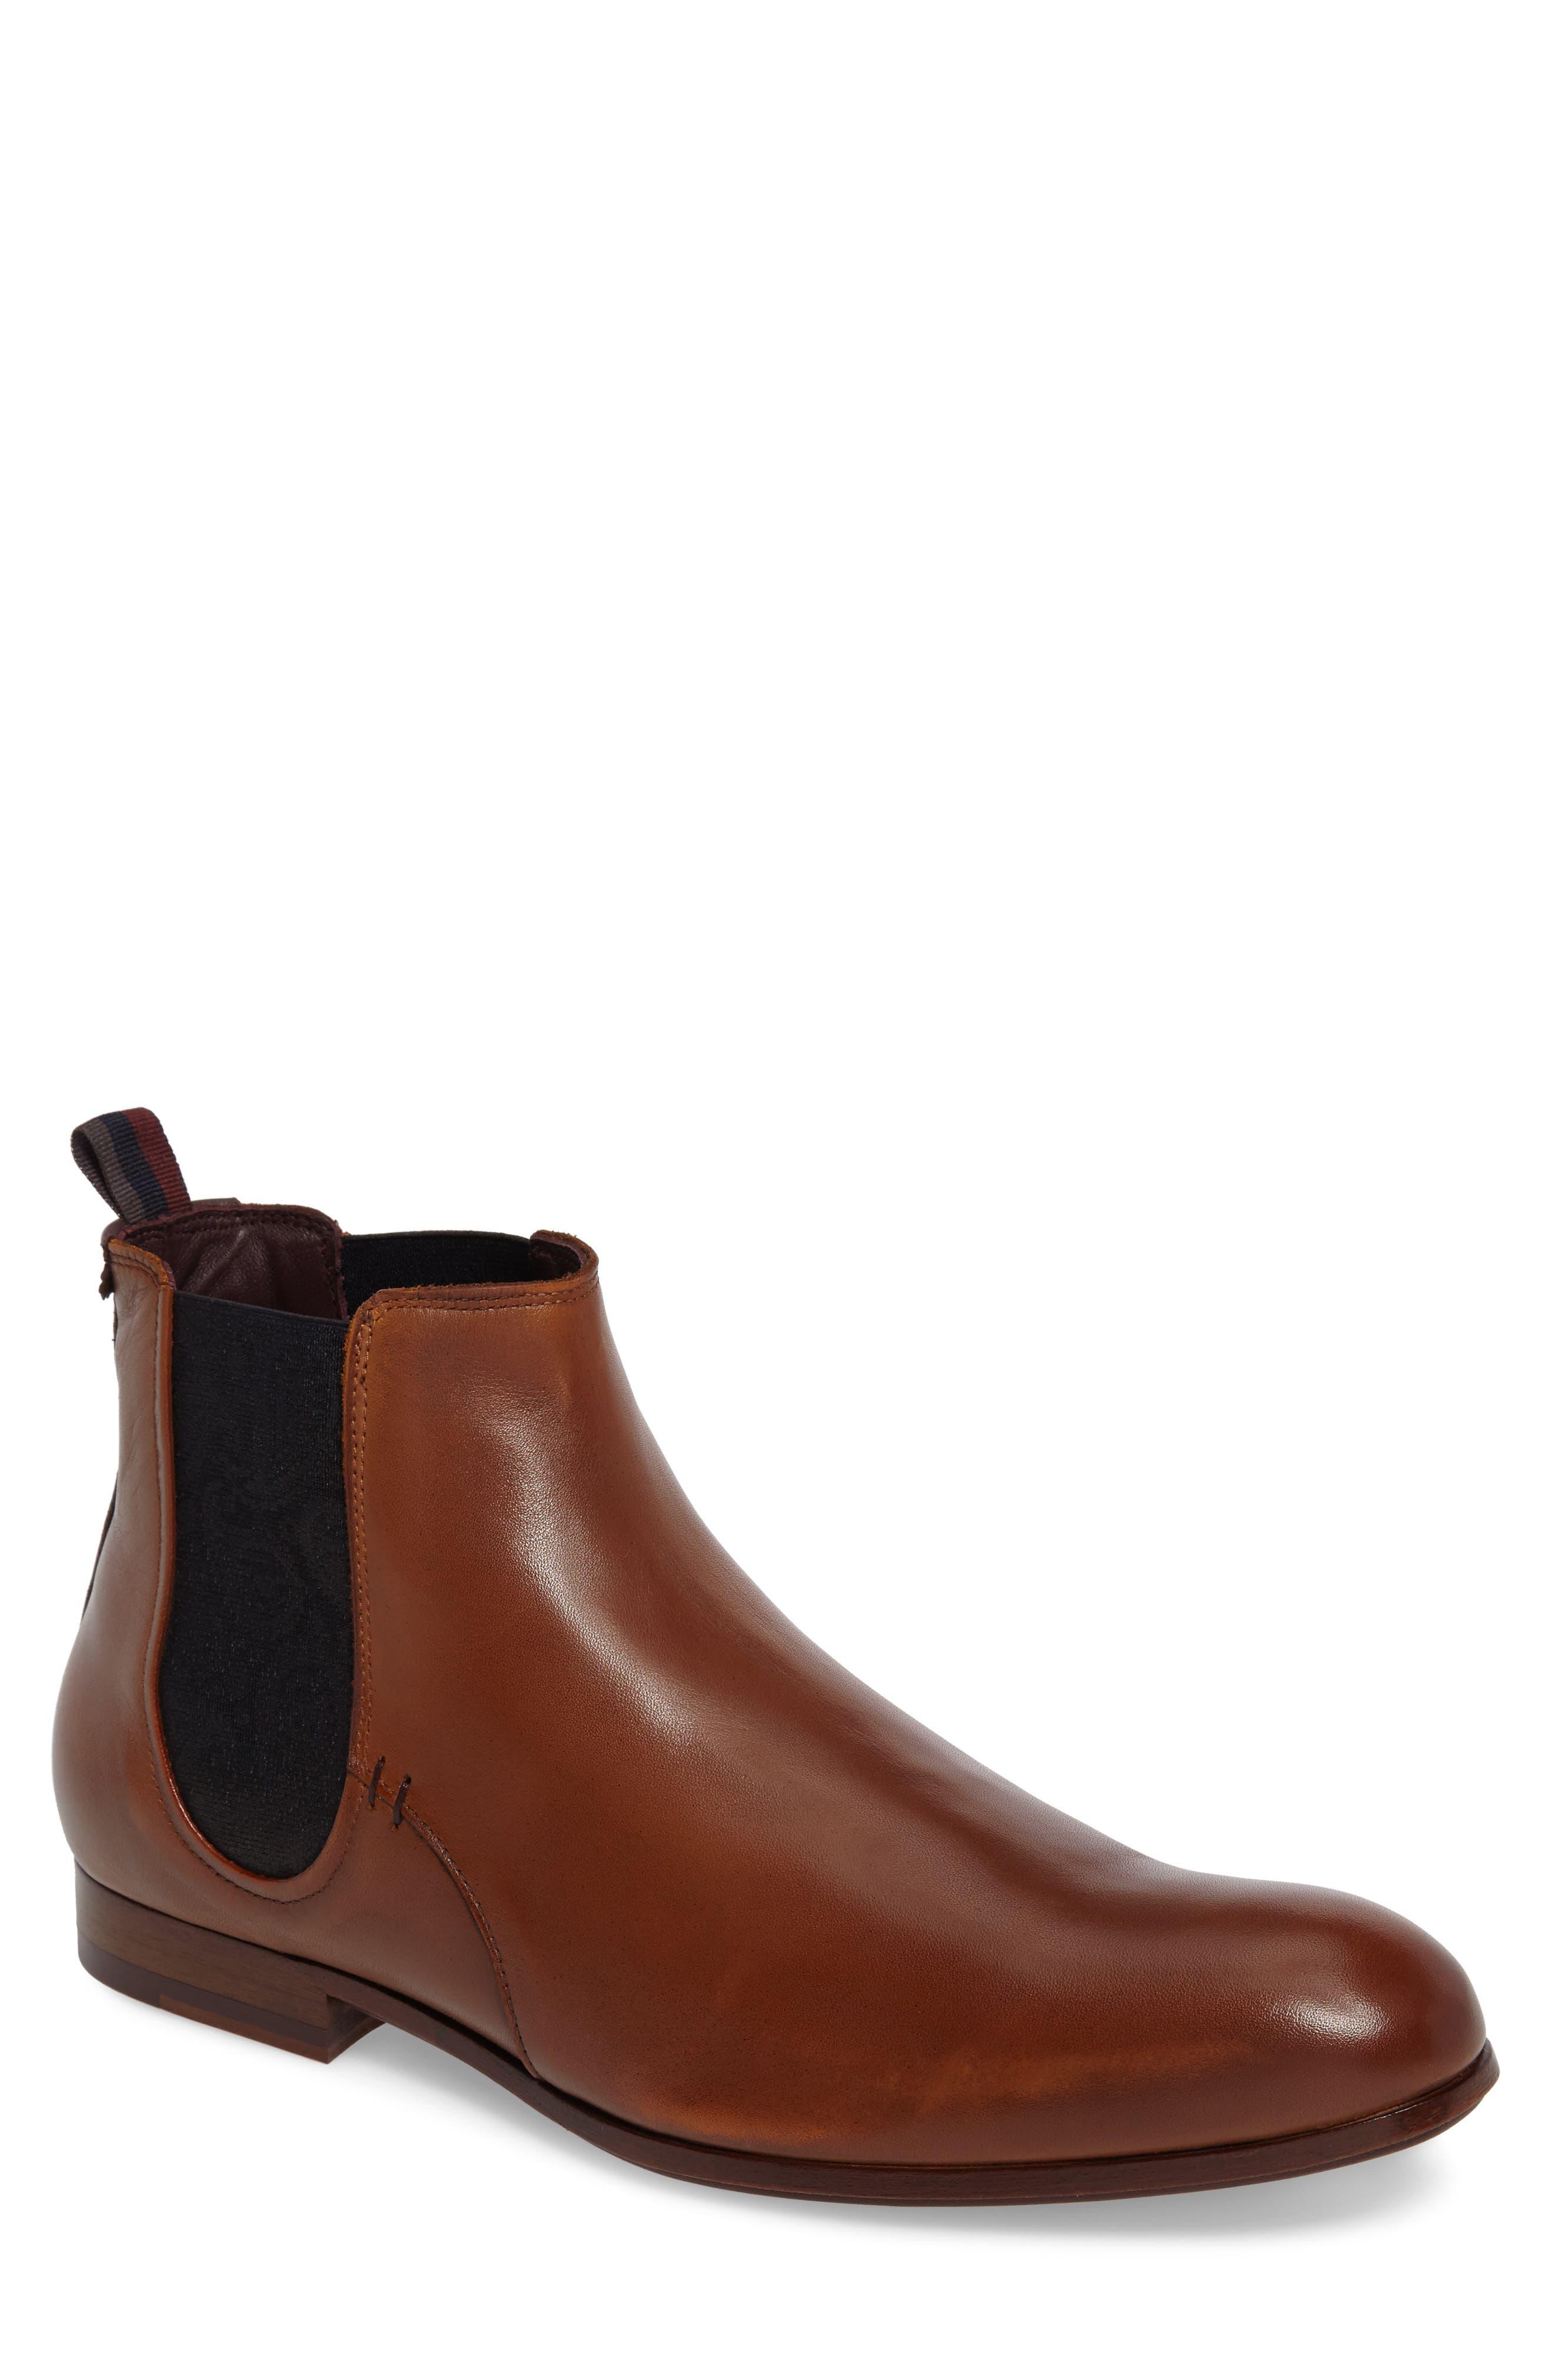 Zenier Chelsea Boot,                         Main,                         color,